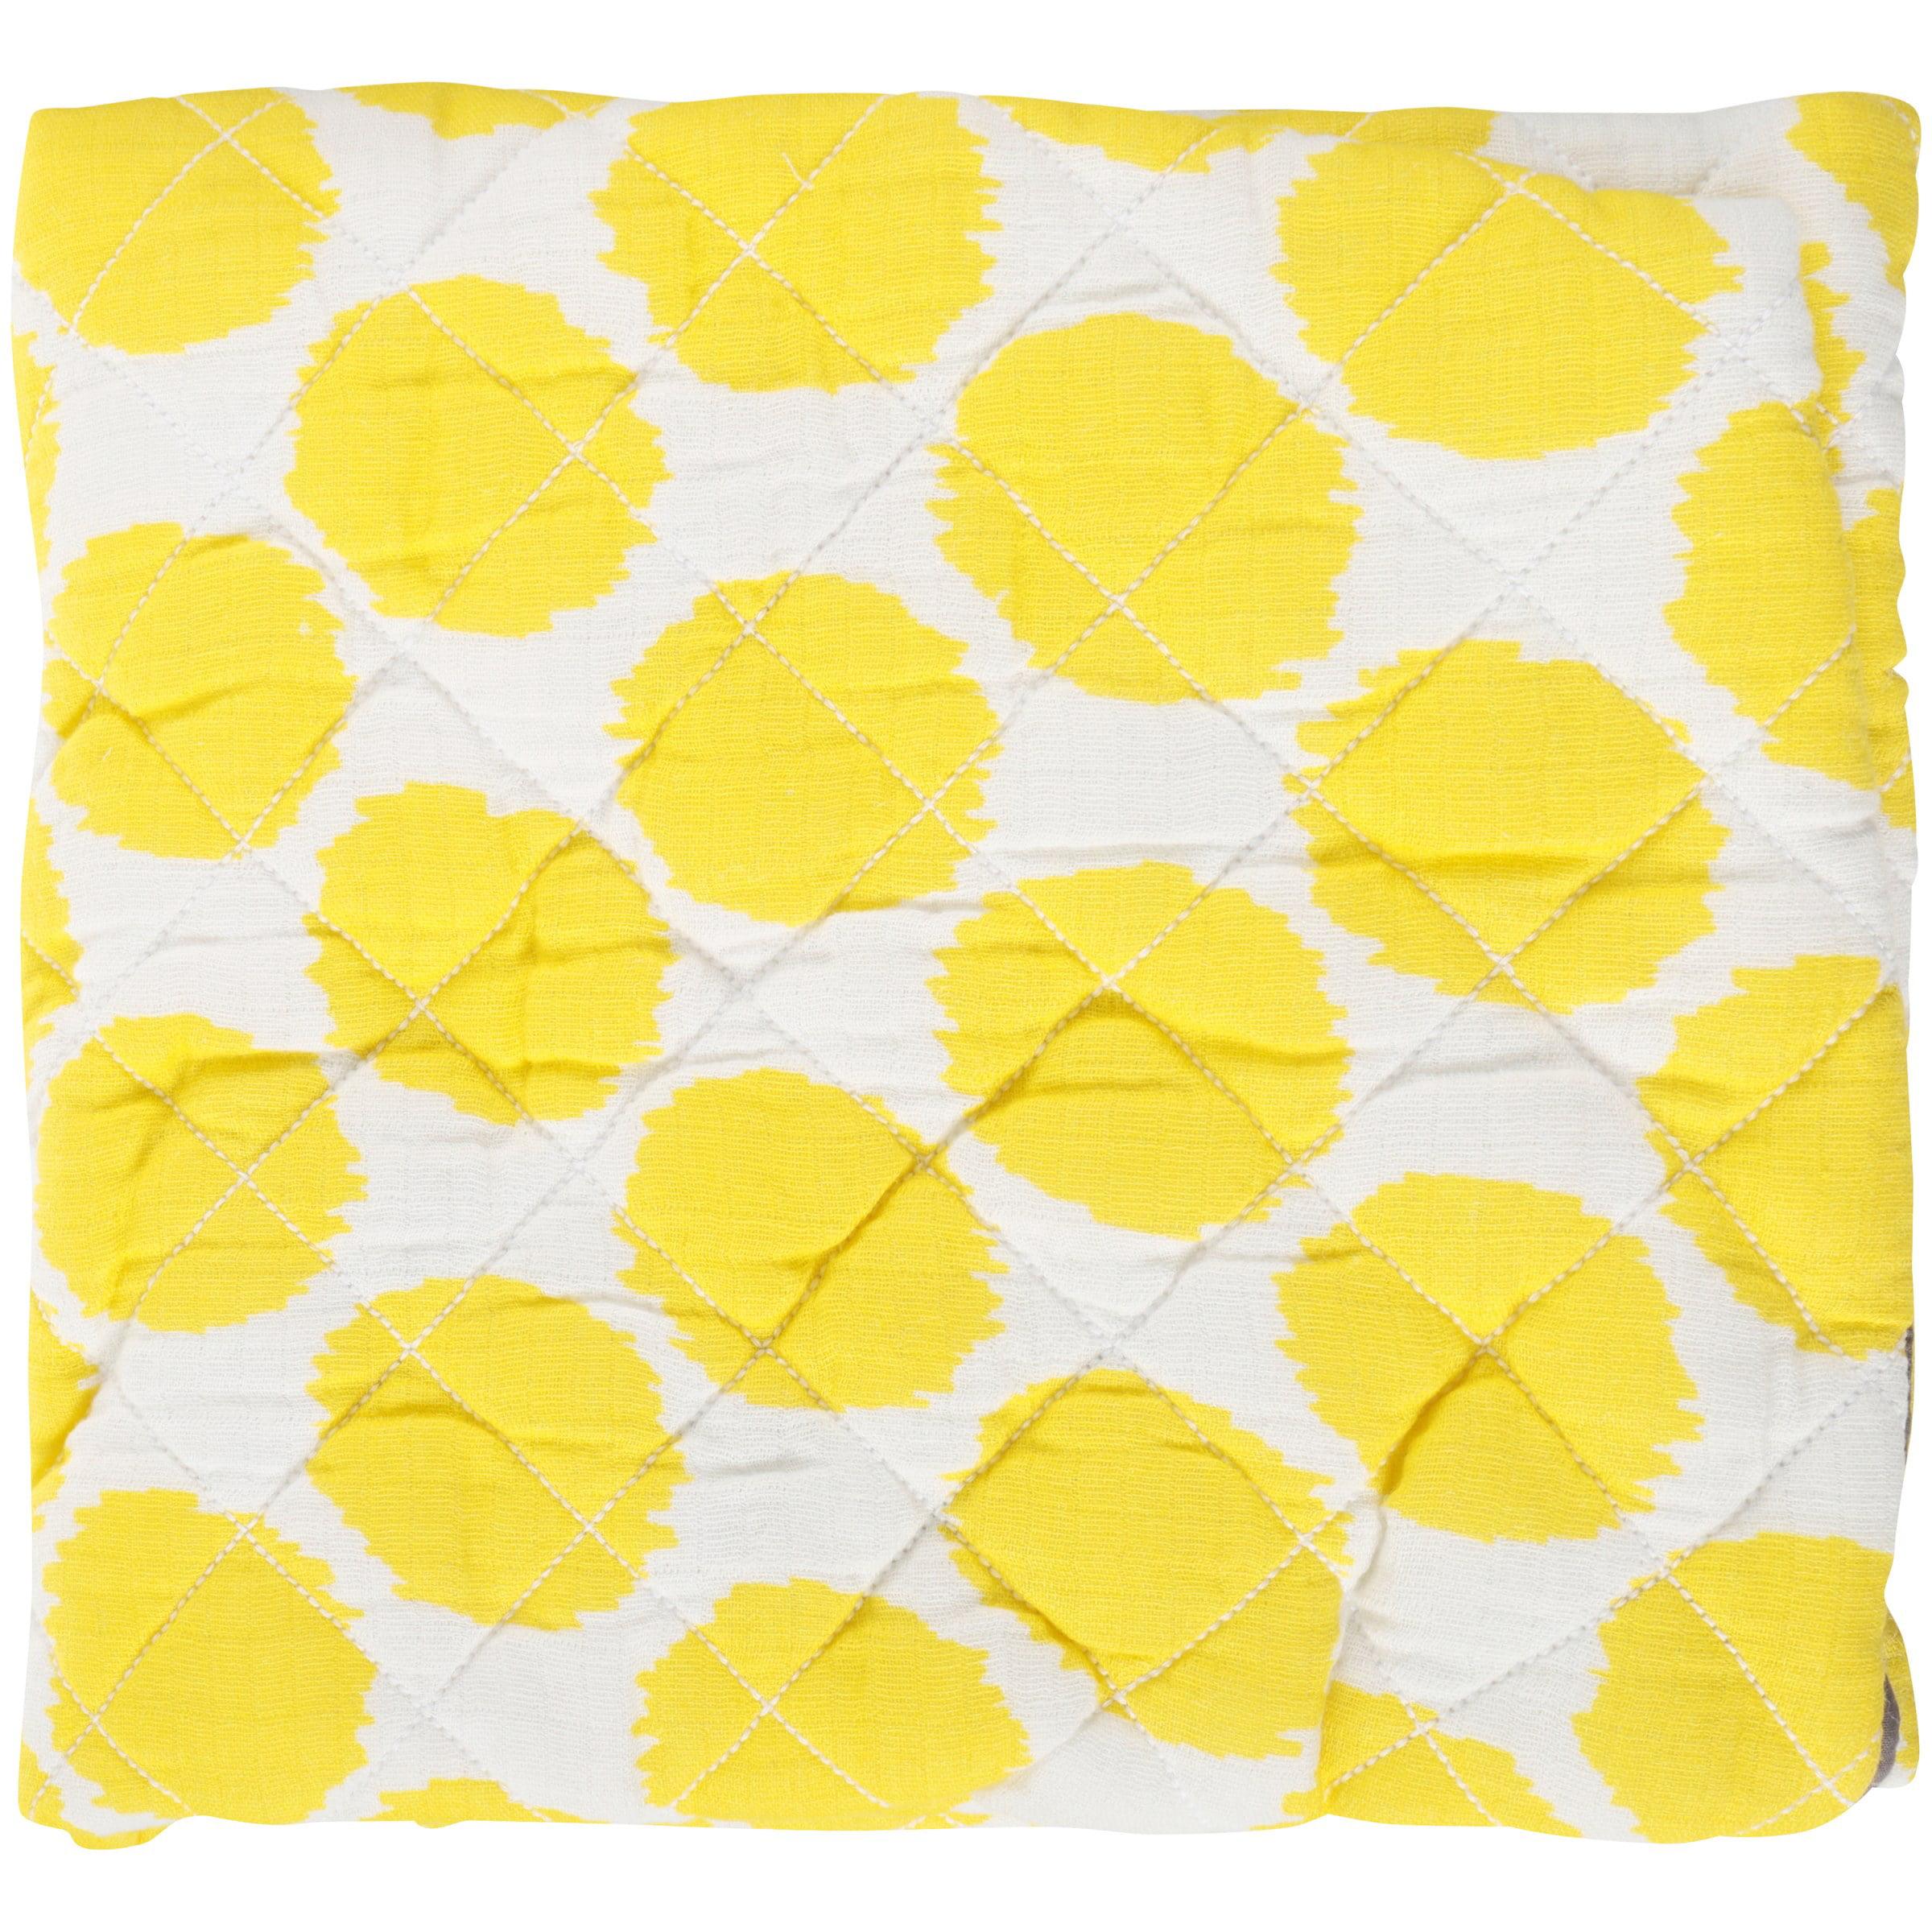 Bacati Ikat Zigzag Yellow Dots Changing Pad Cover